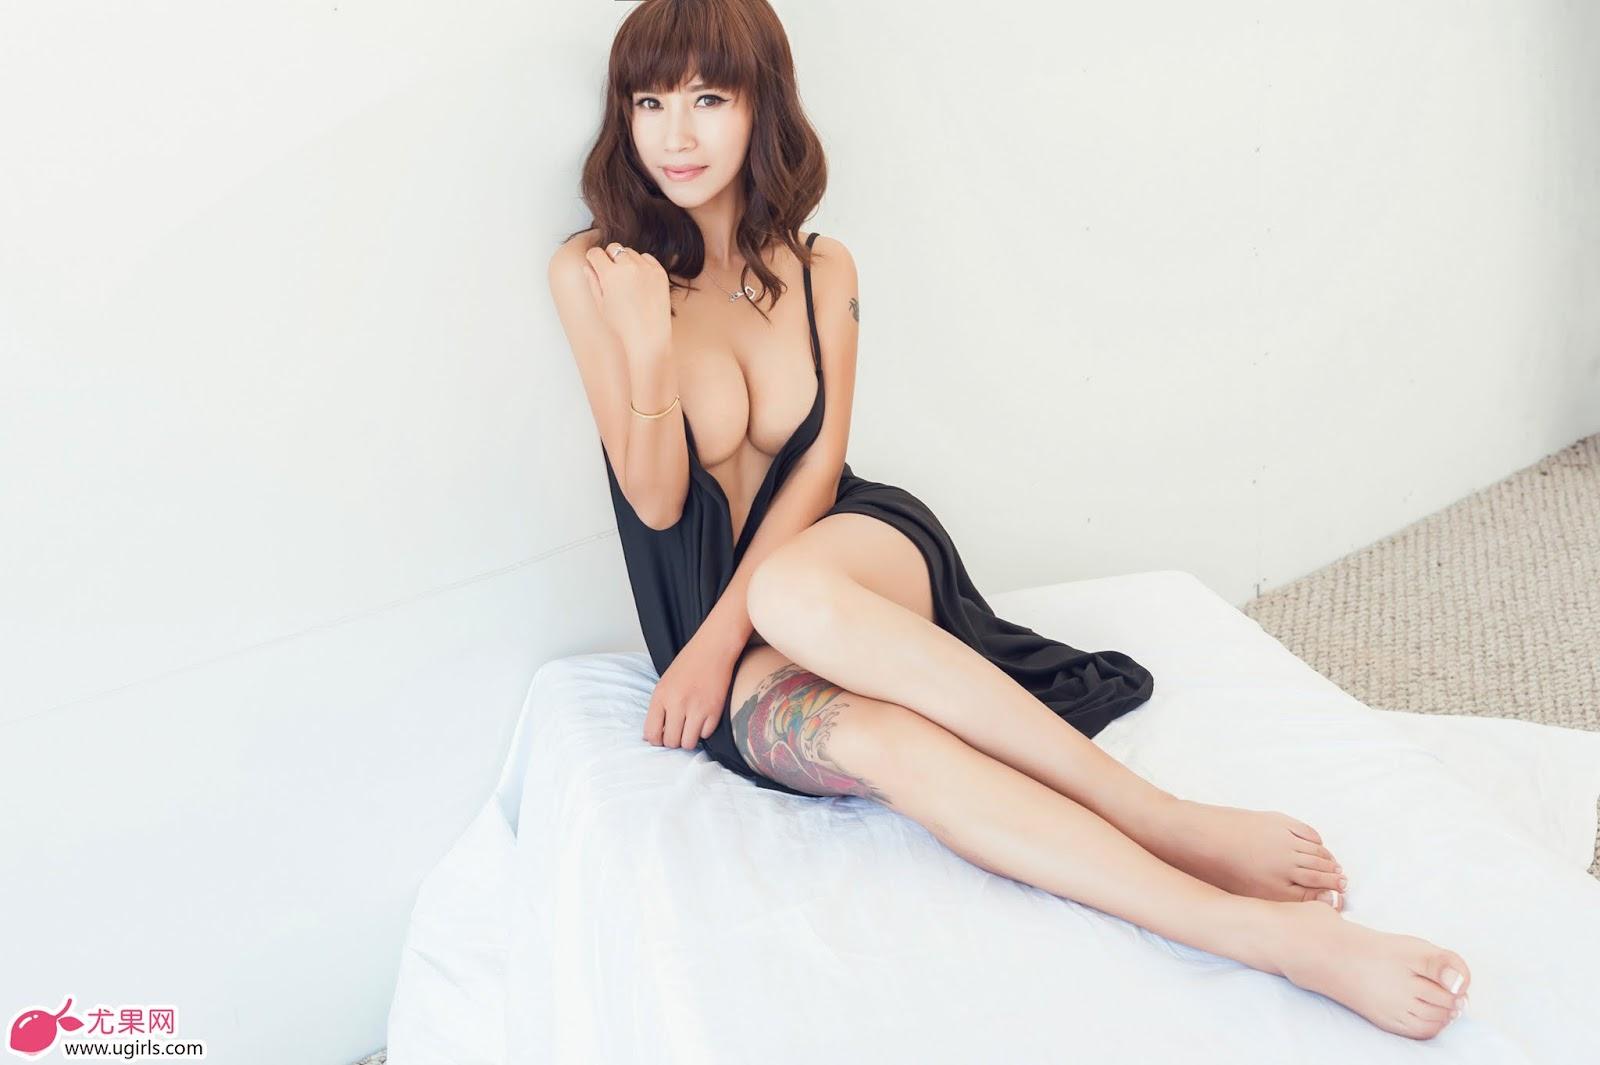 DLS 0160 - Hot Girl Ugirls No.021 Model: 田依依